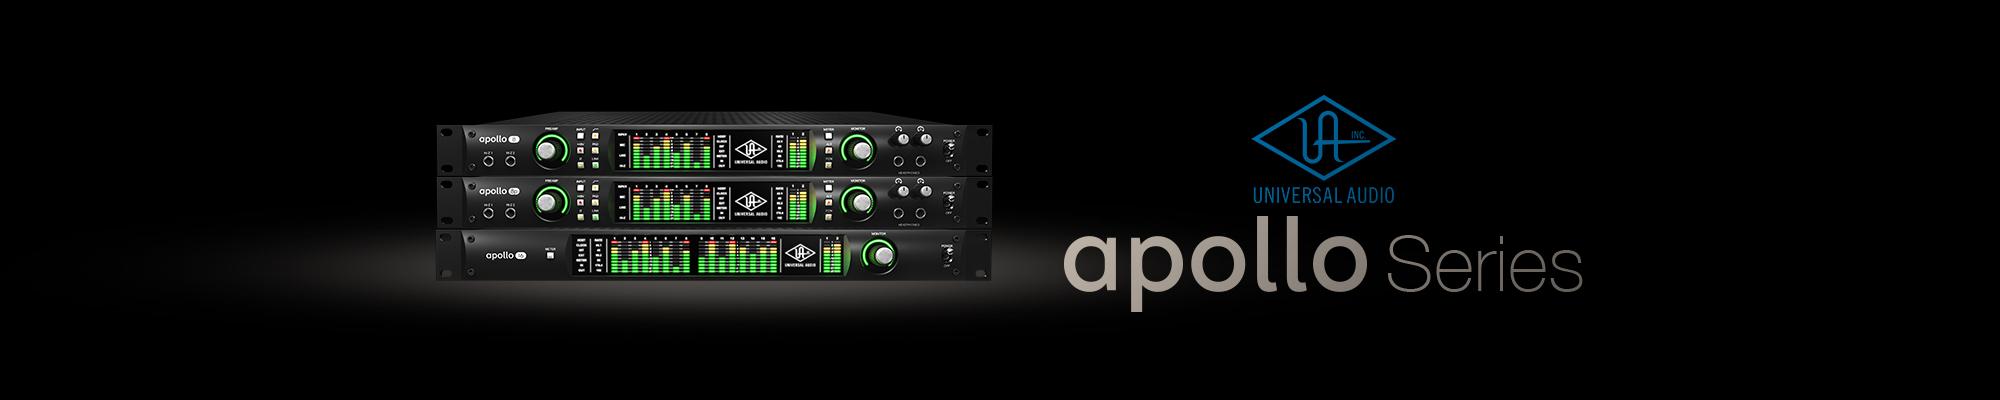 Universal Audio Apollo Series